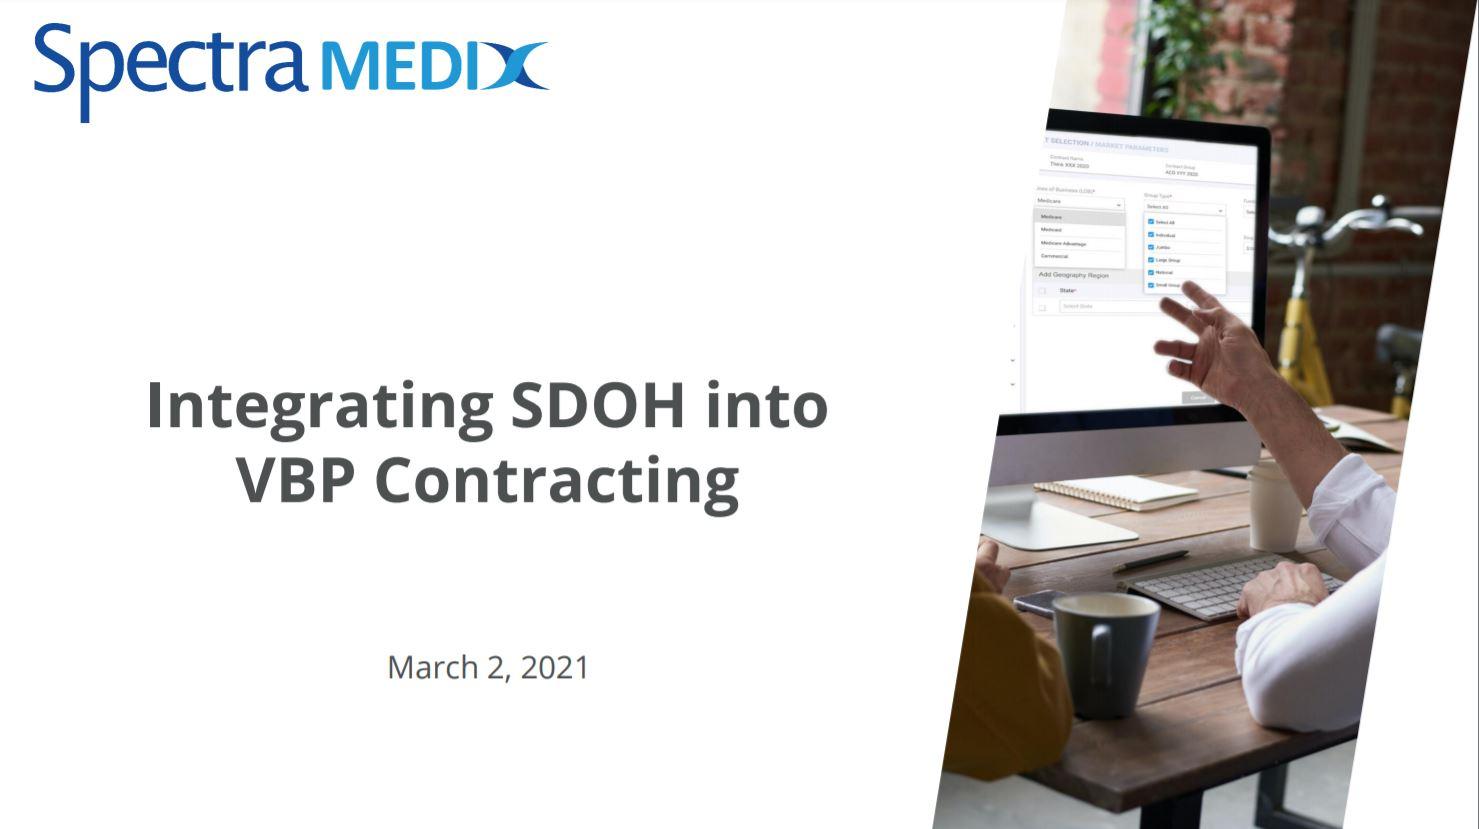 Integrating SDOH into VBP Contracting